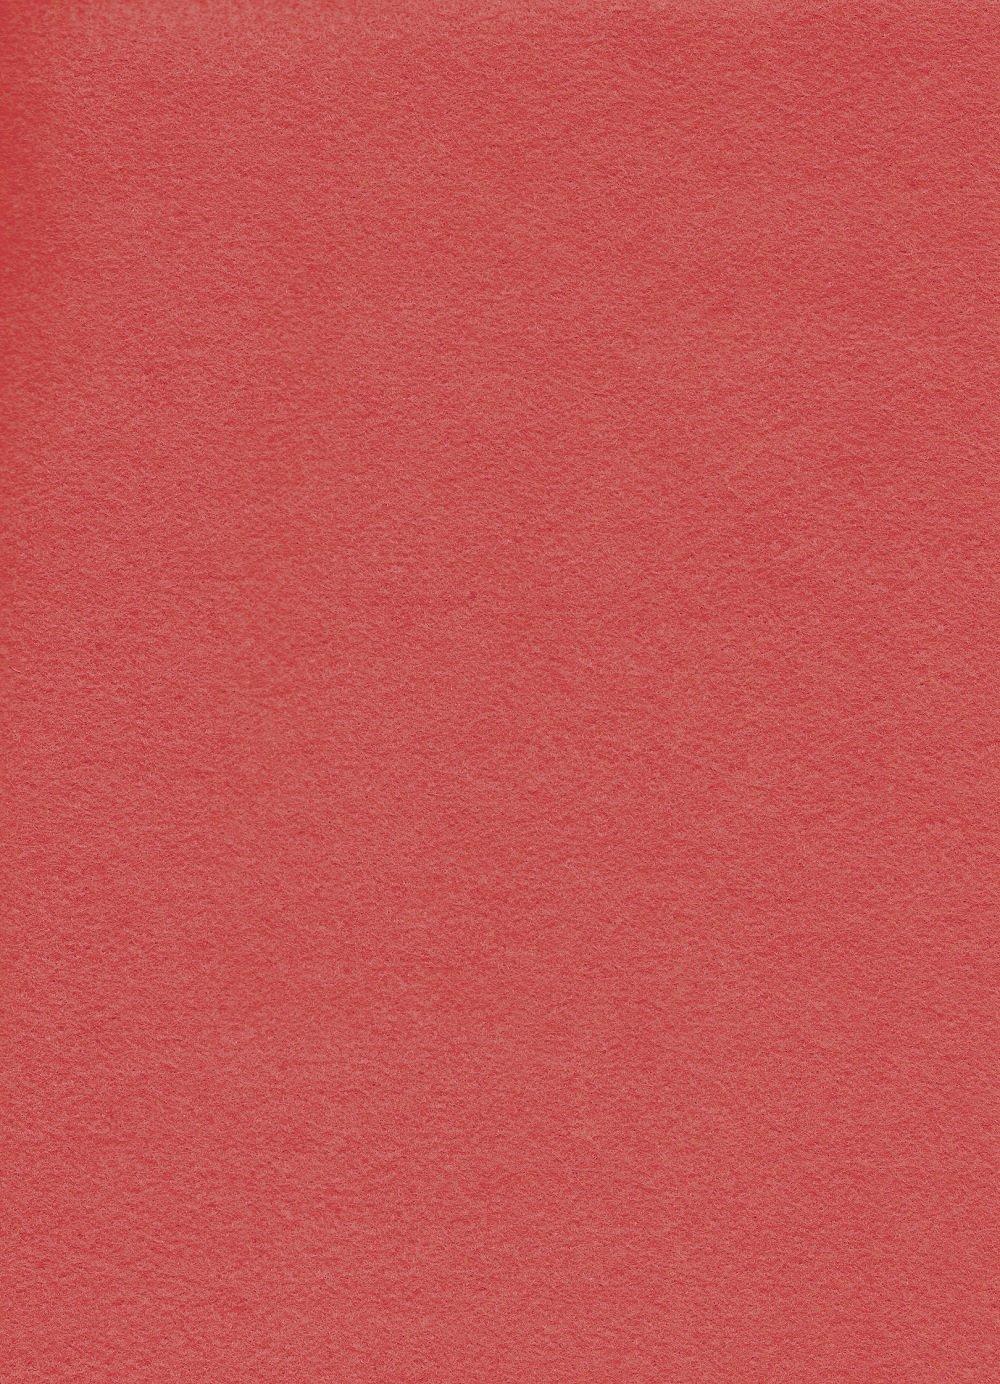 English Rose - 12 x 18 Square